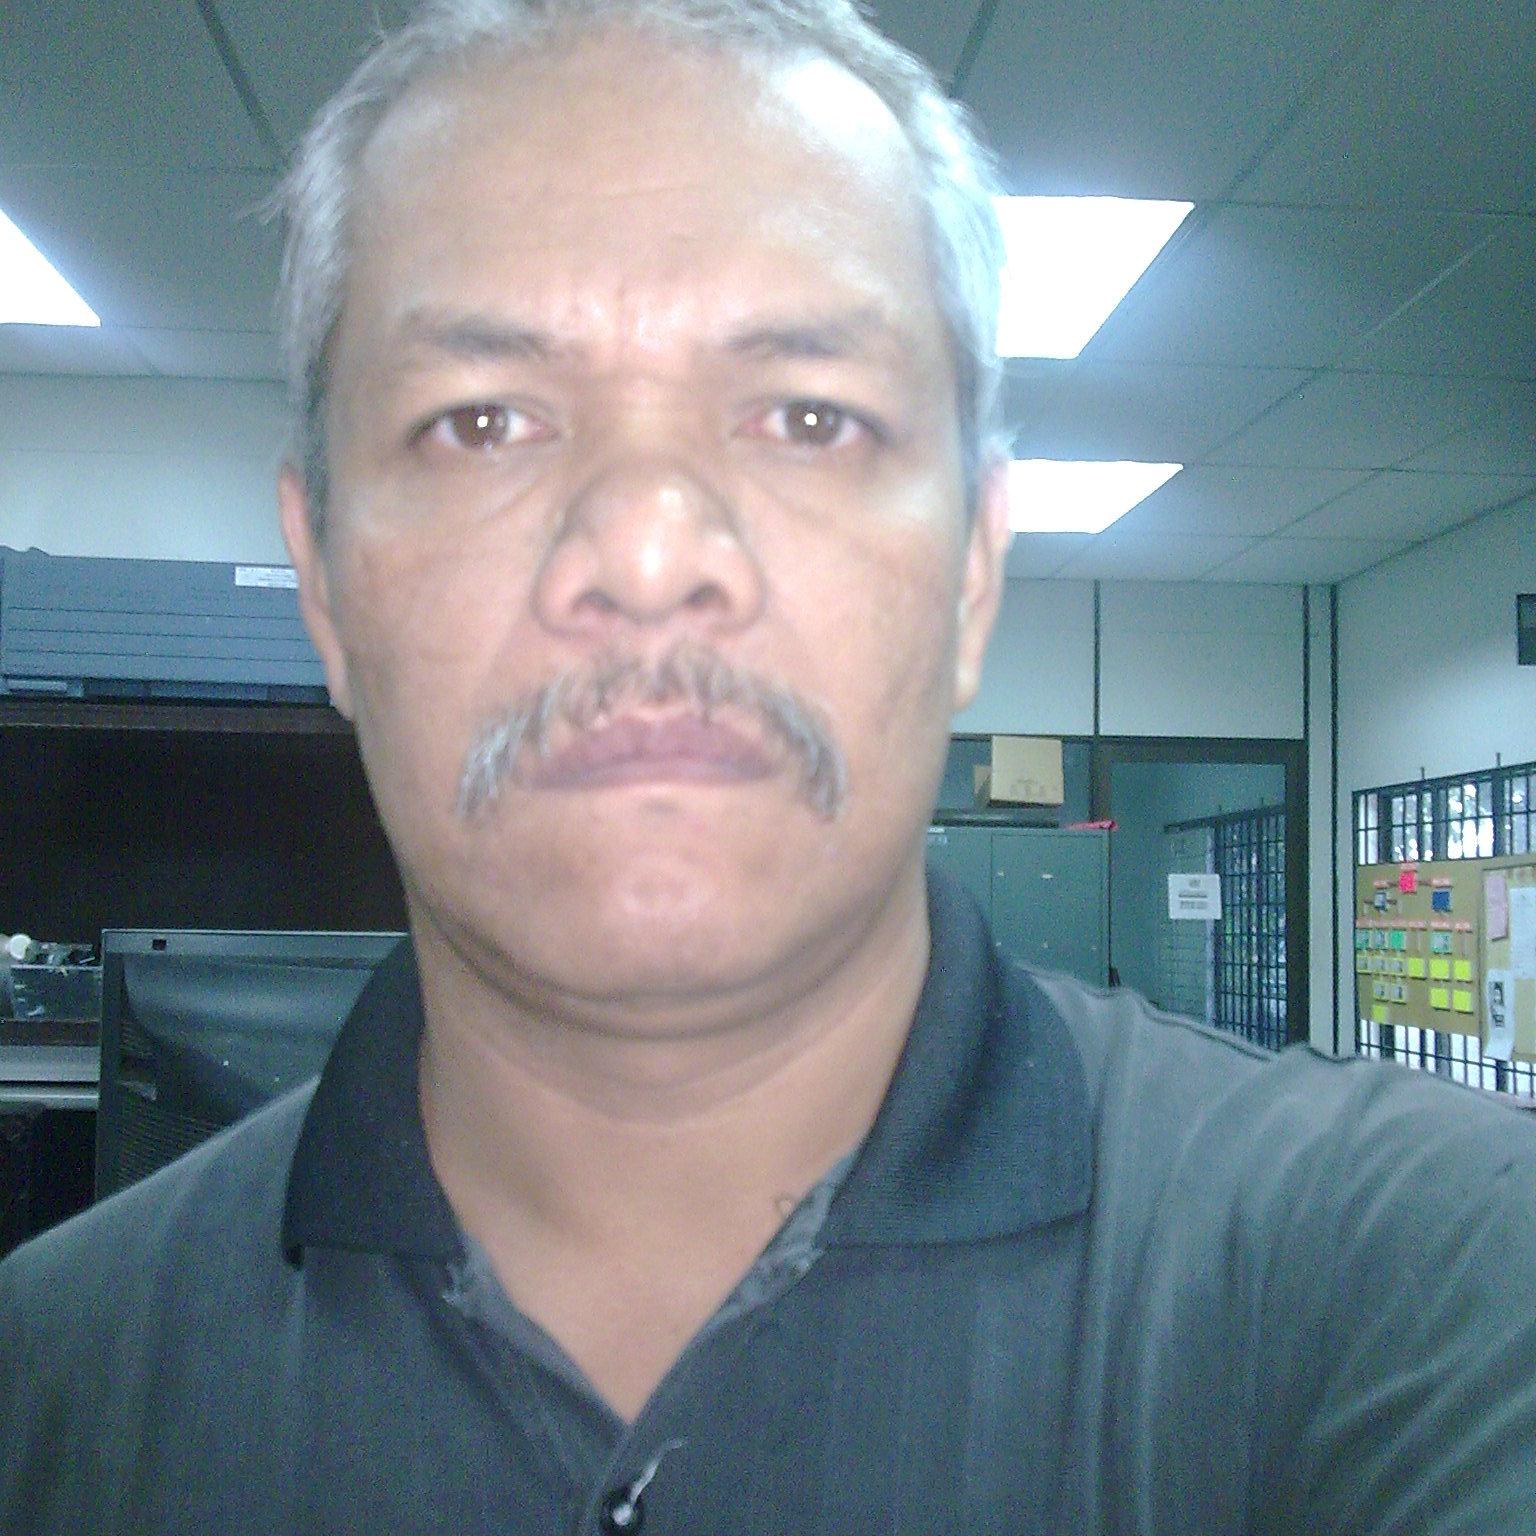 Mohd Dzahir Bin Mat Rejab